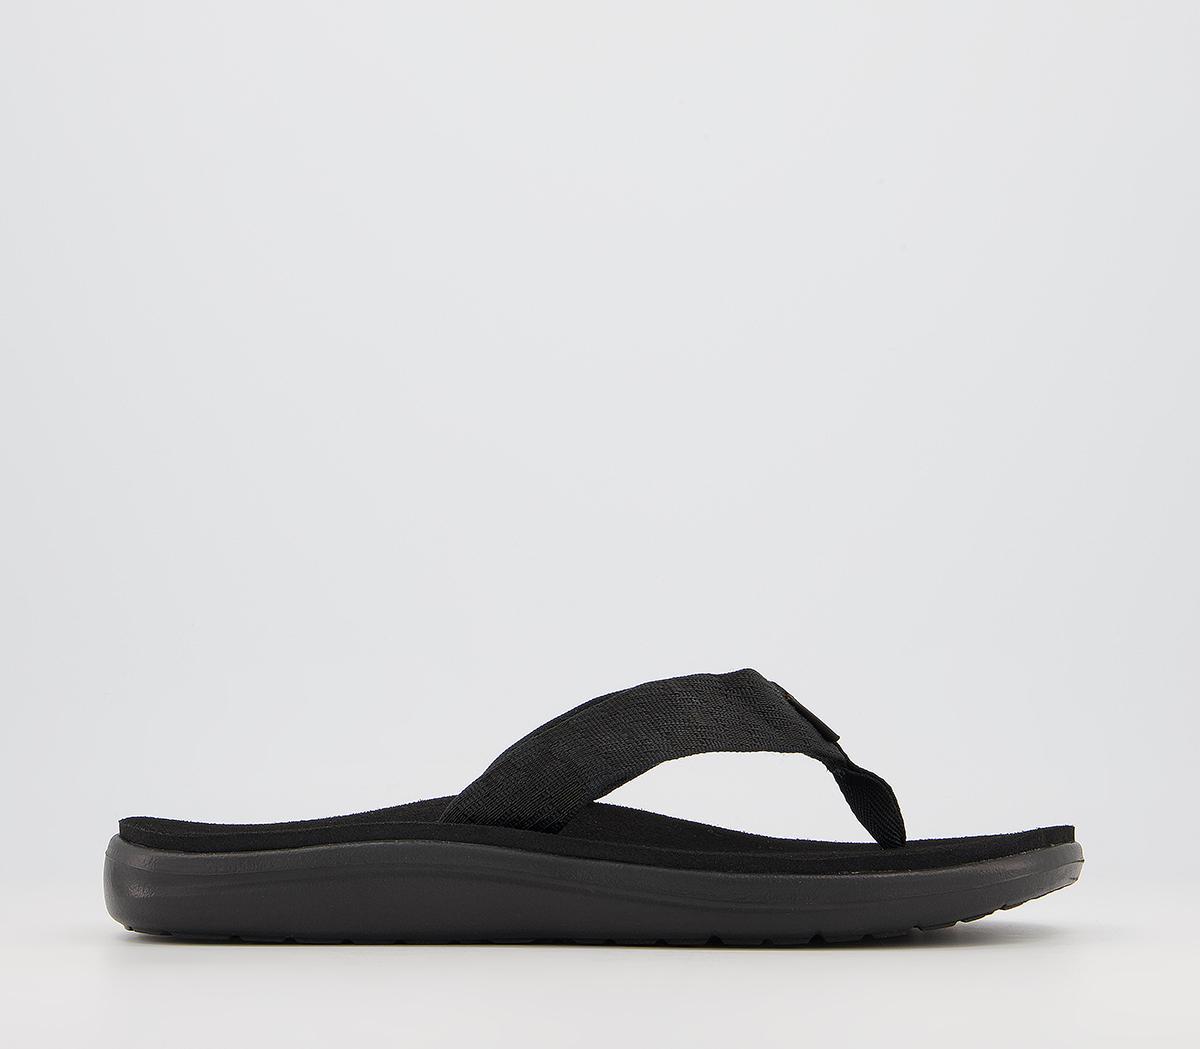 Voya Flip Flops